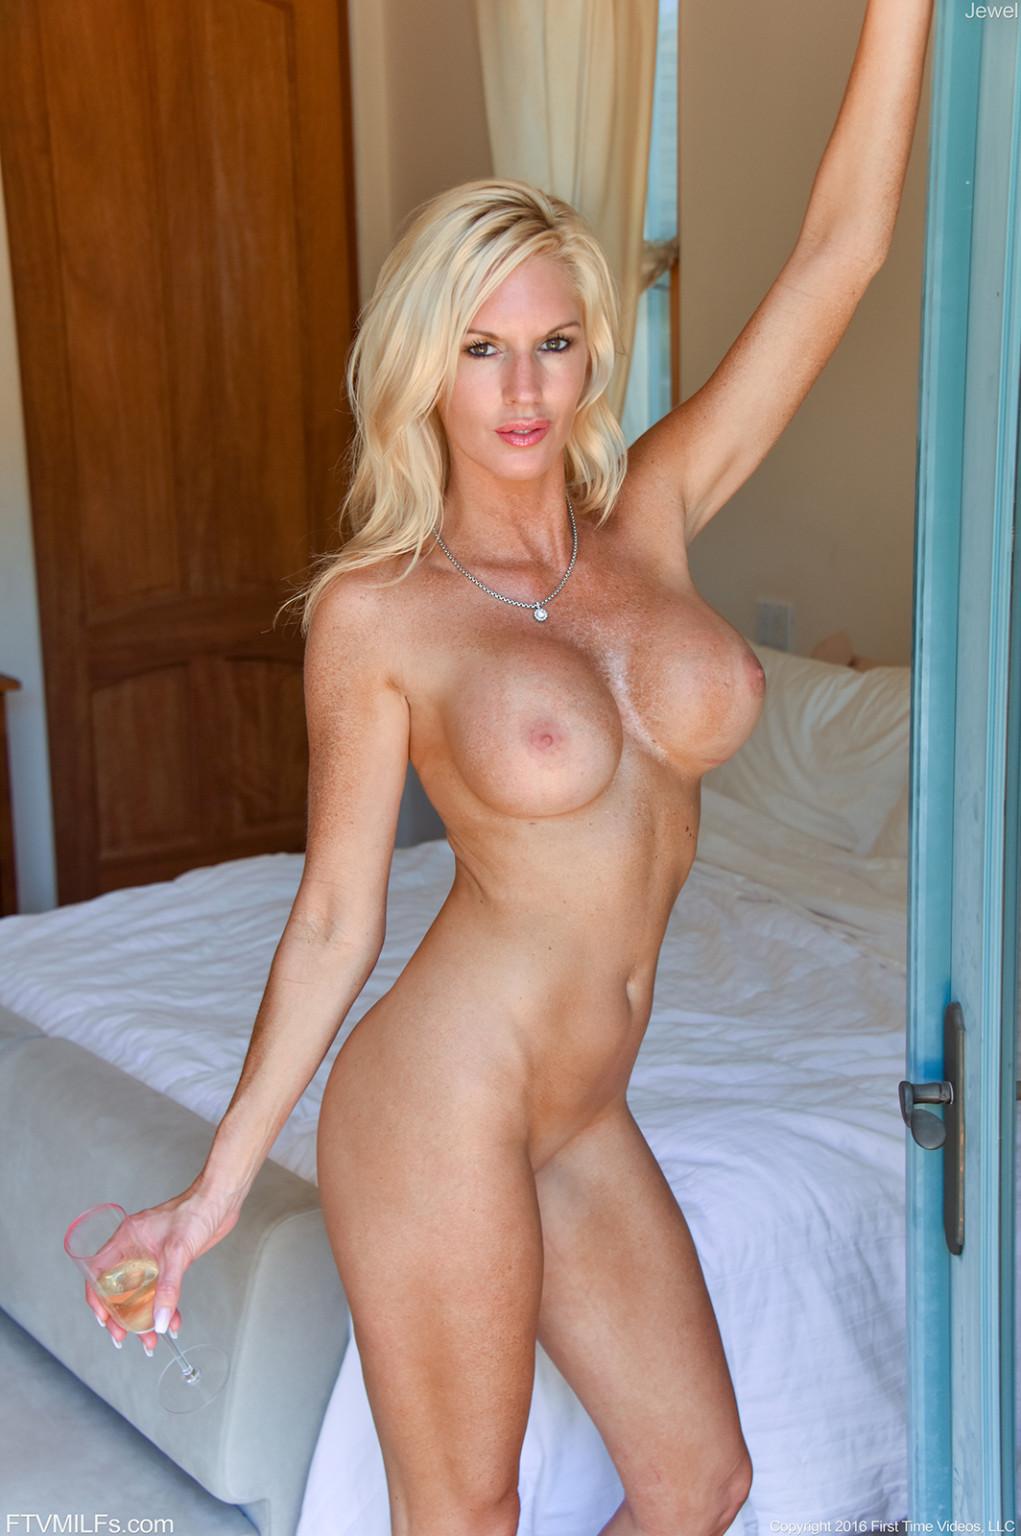 Chelsea clinton nude